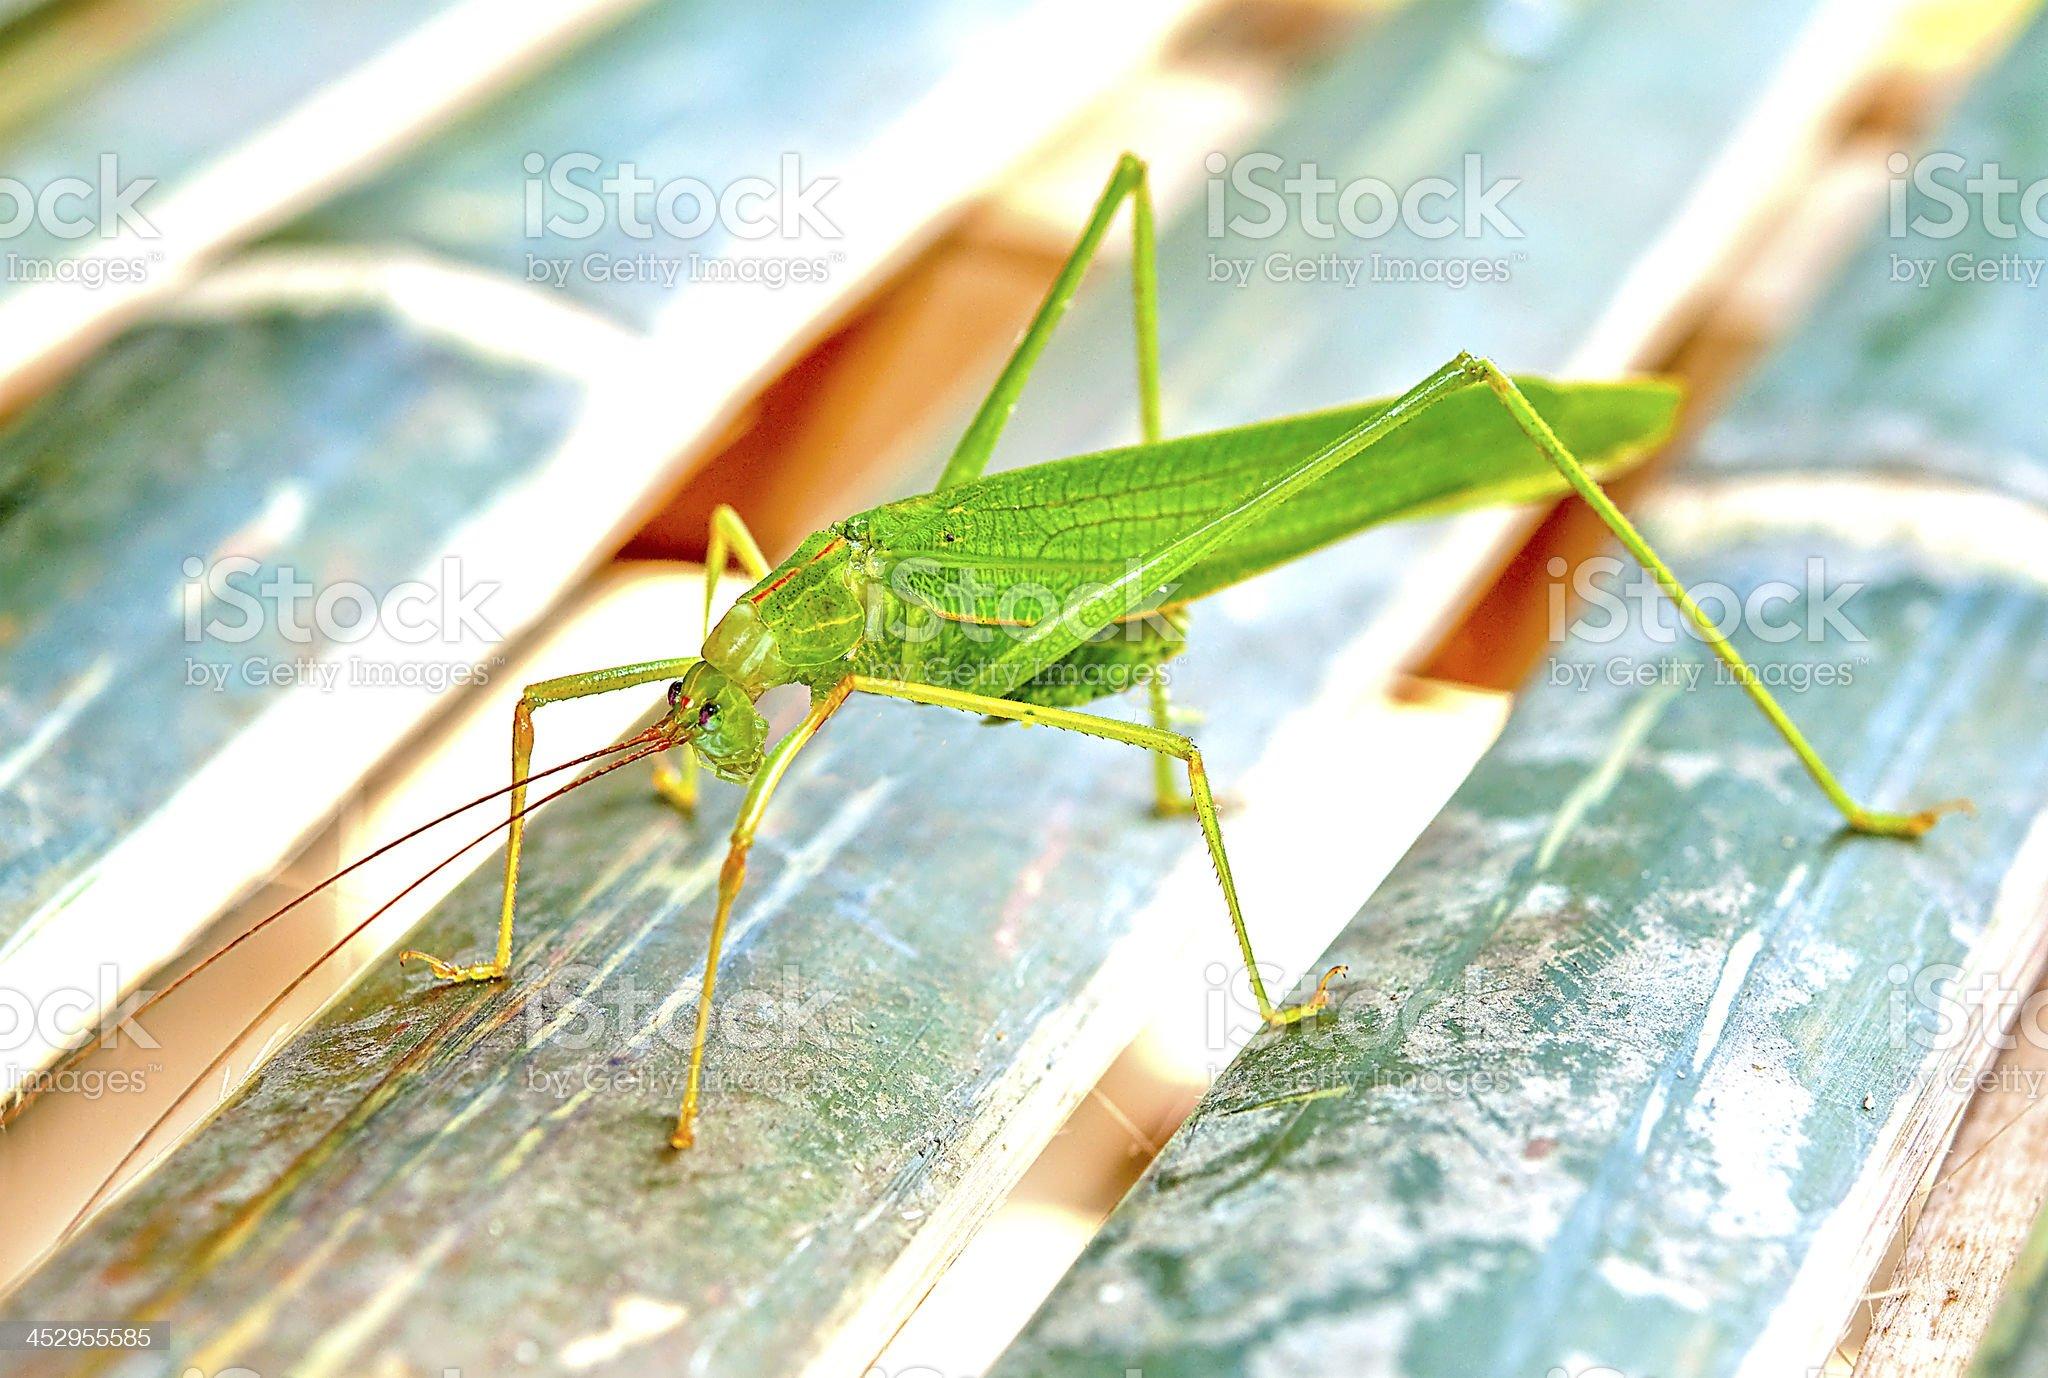 The Green grasshopper royalty-free stock photo